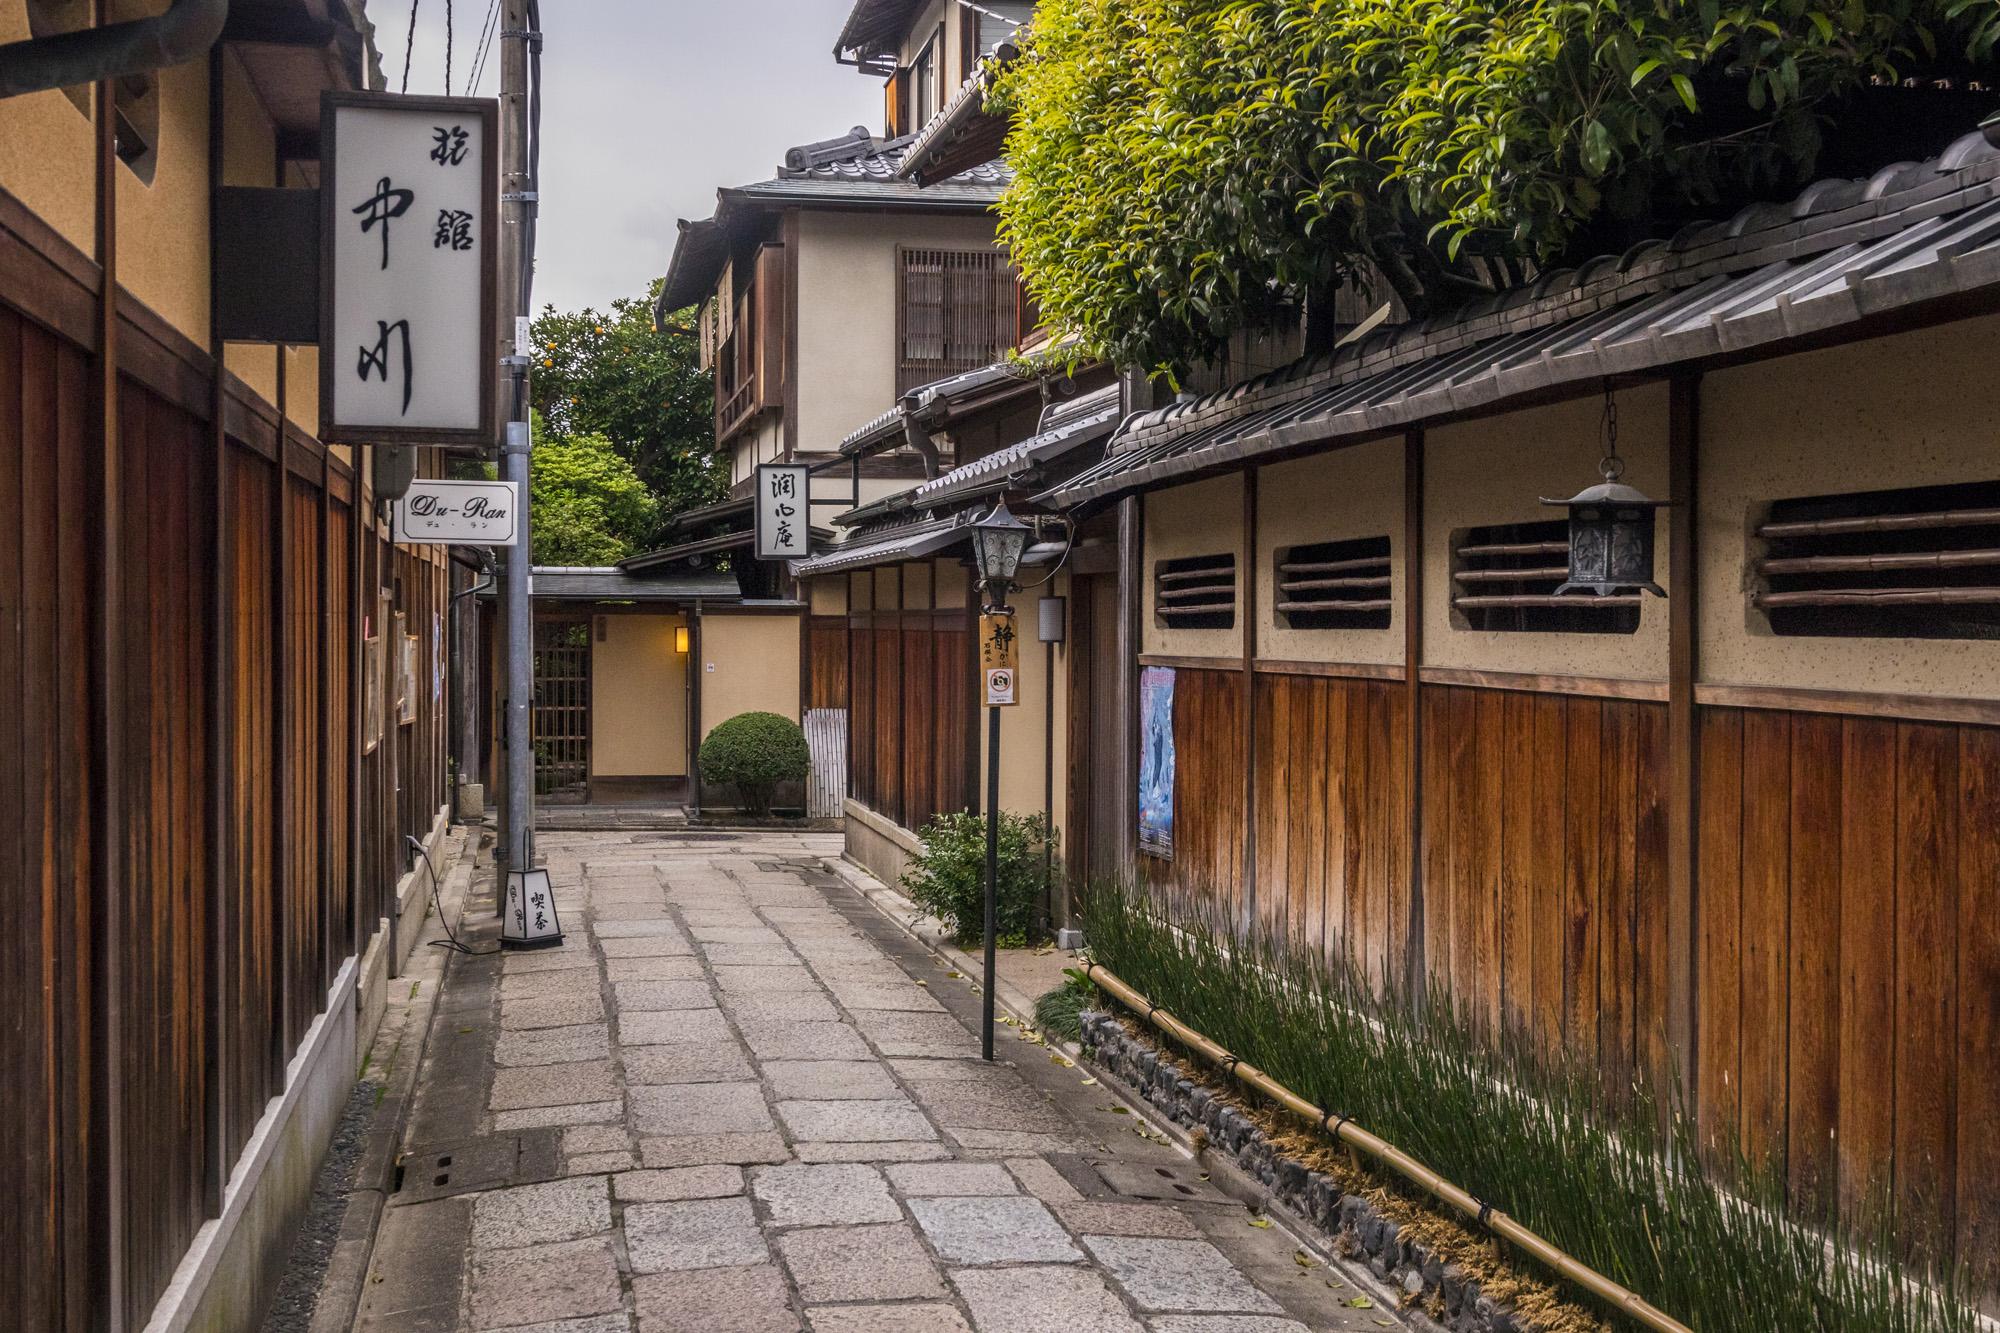 Ishibei-koji dans la ville de Kyōto au Japon